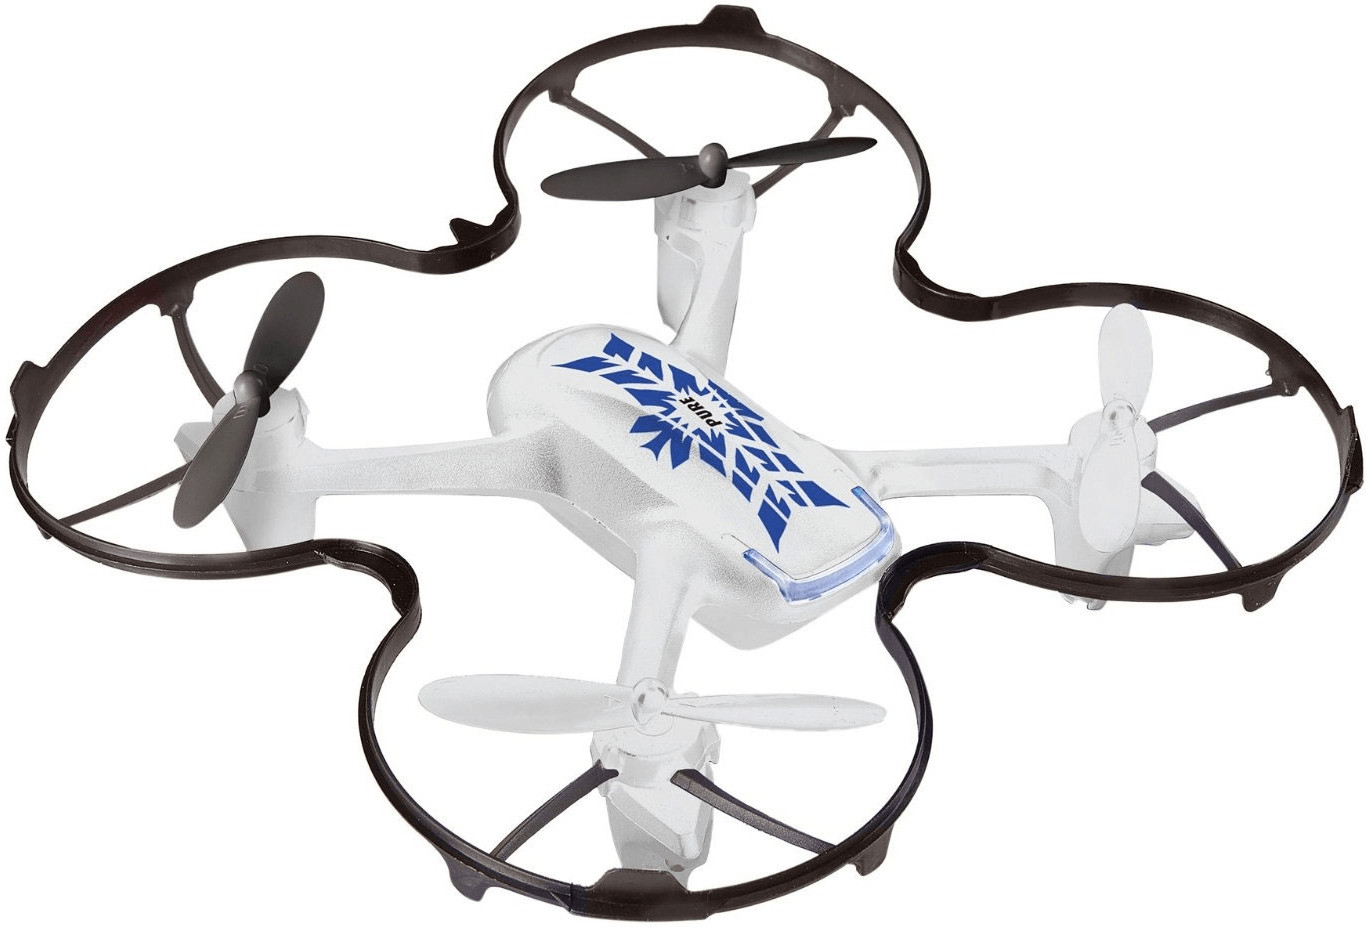 Revell Quadrocopter Pure (23921)